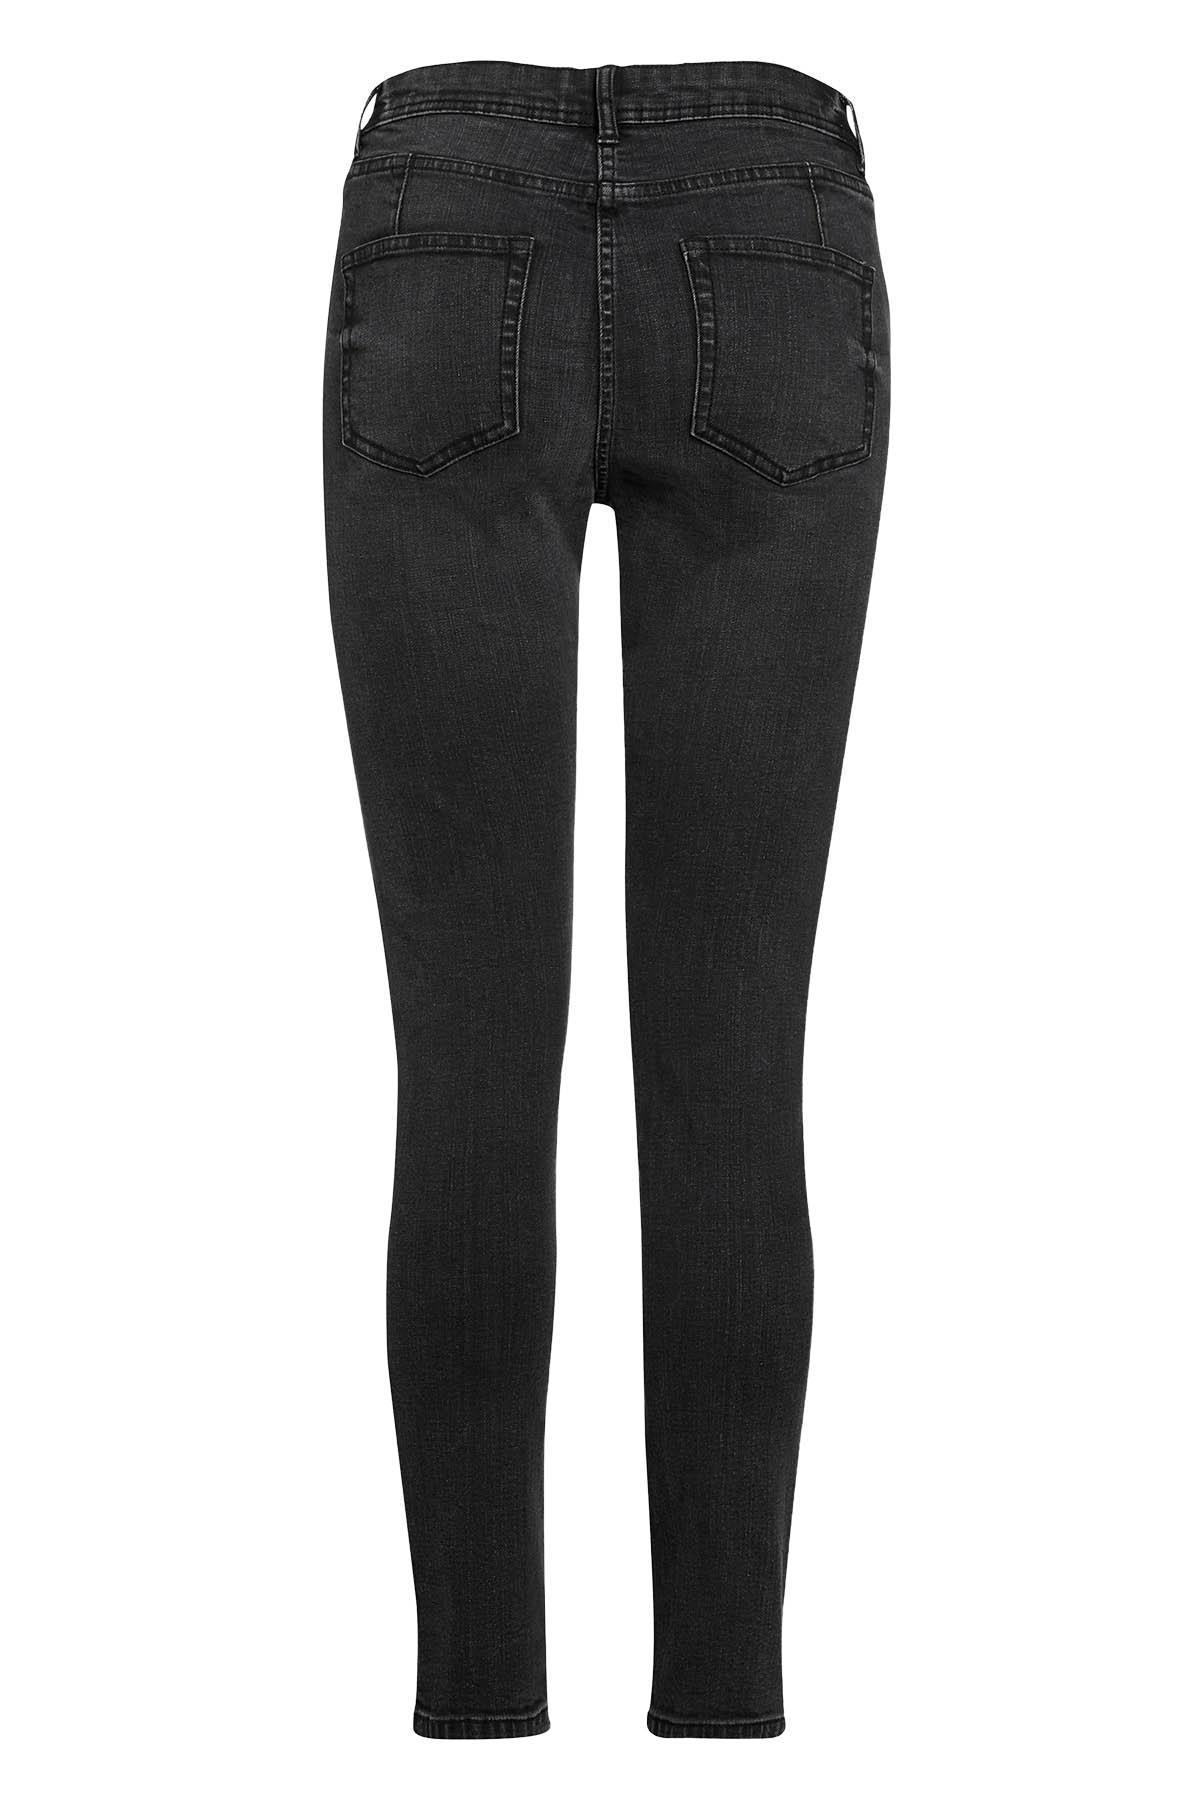 Ladies-Skinny-Jeans-New-ex-Next-Extra-Stretch-Size-6-18-Short-Reg-X-Long-Tall thumbnail 14